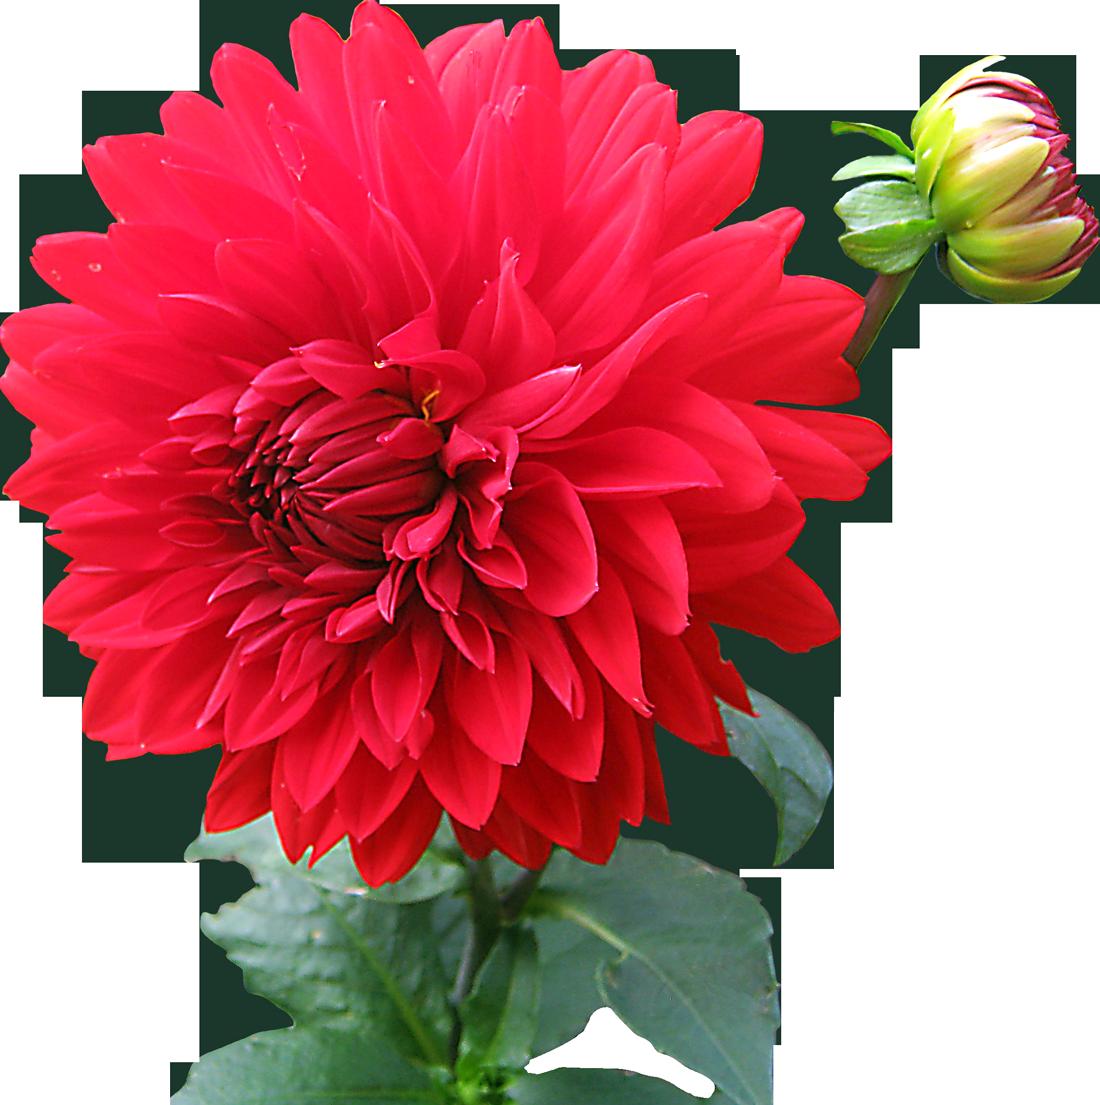 Dahlia Flower Png Image Flower Images Flower Images Hd Flower Png Images